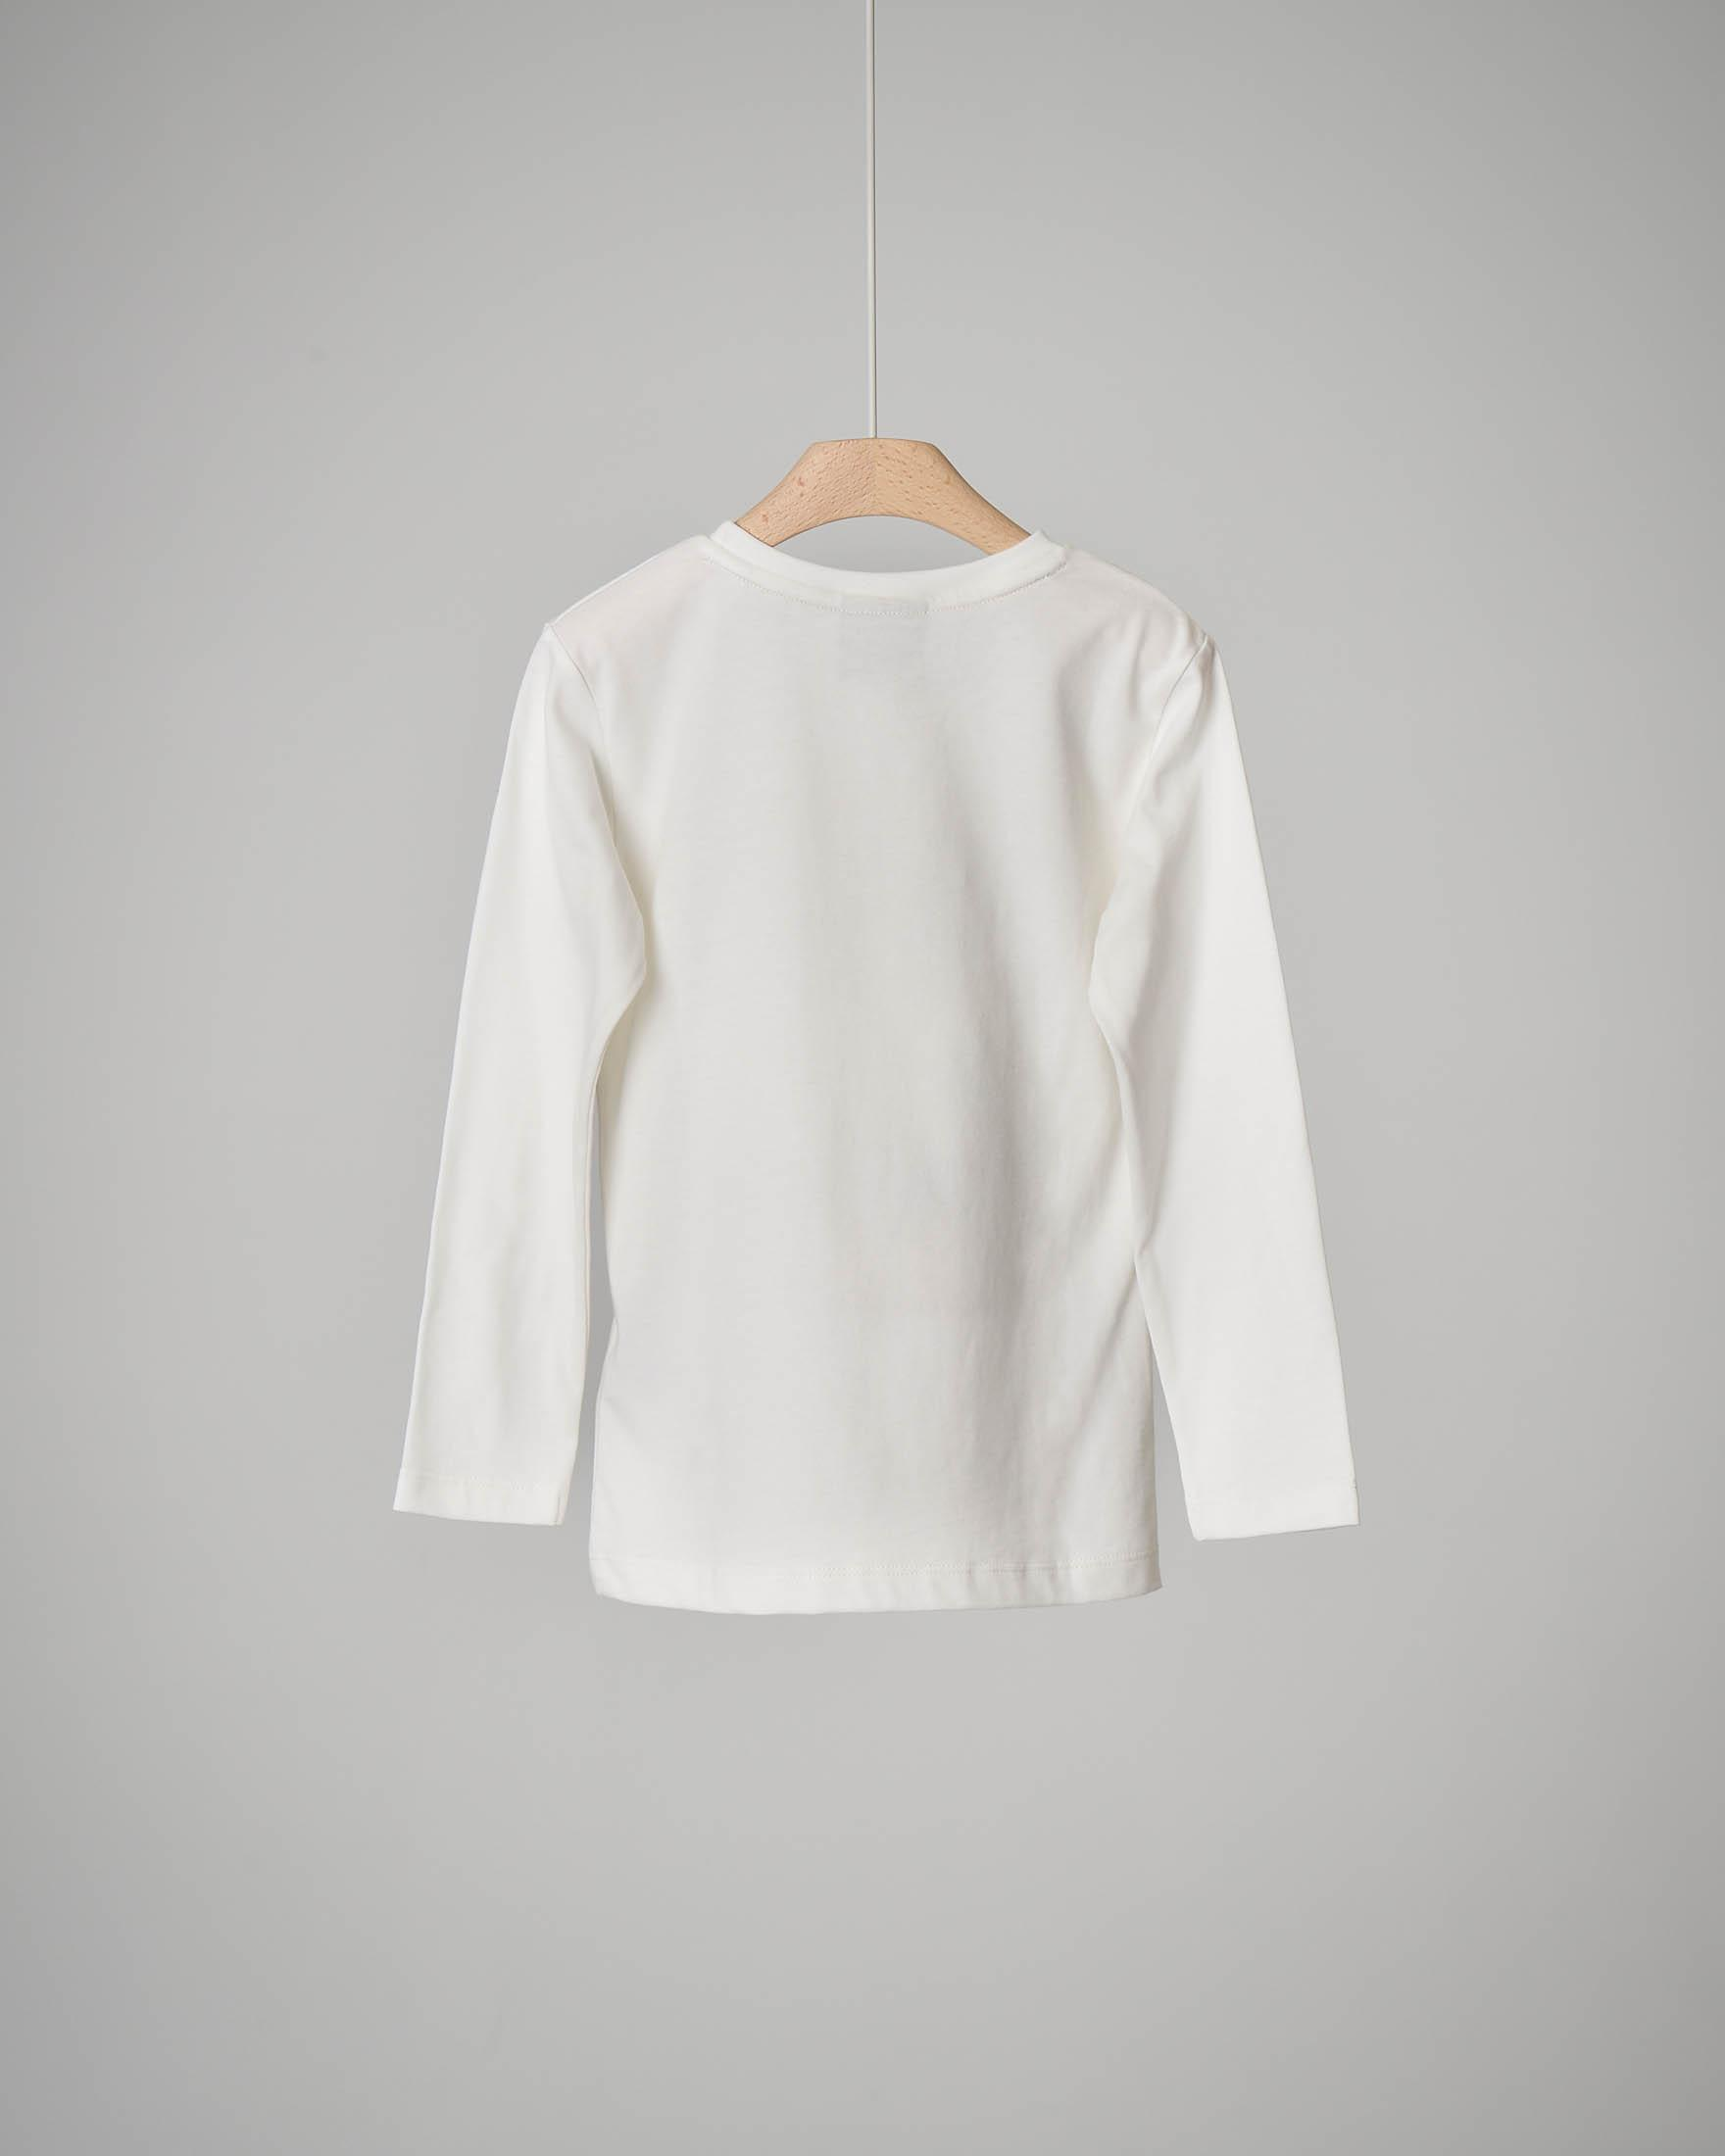 T-shirt bianca a manica lunga con stampa 2-7 anni